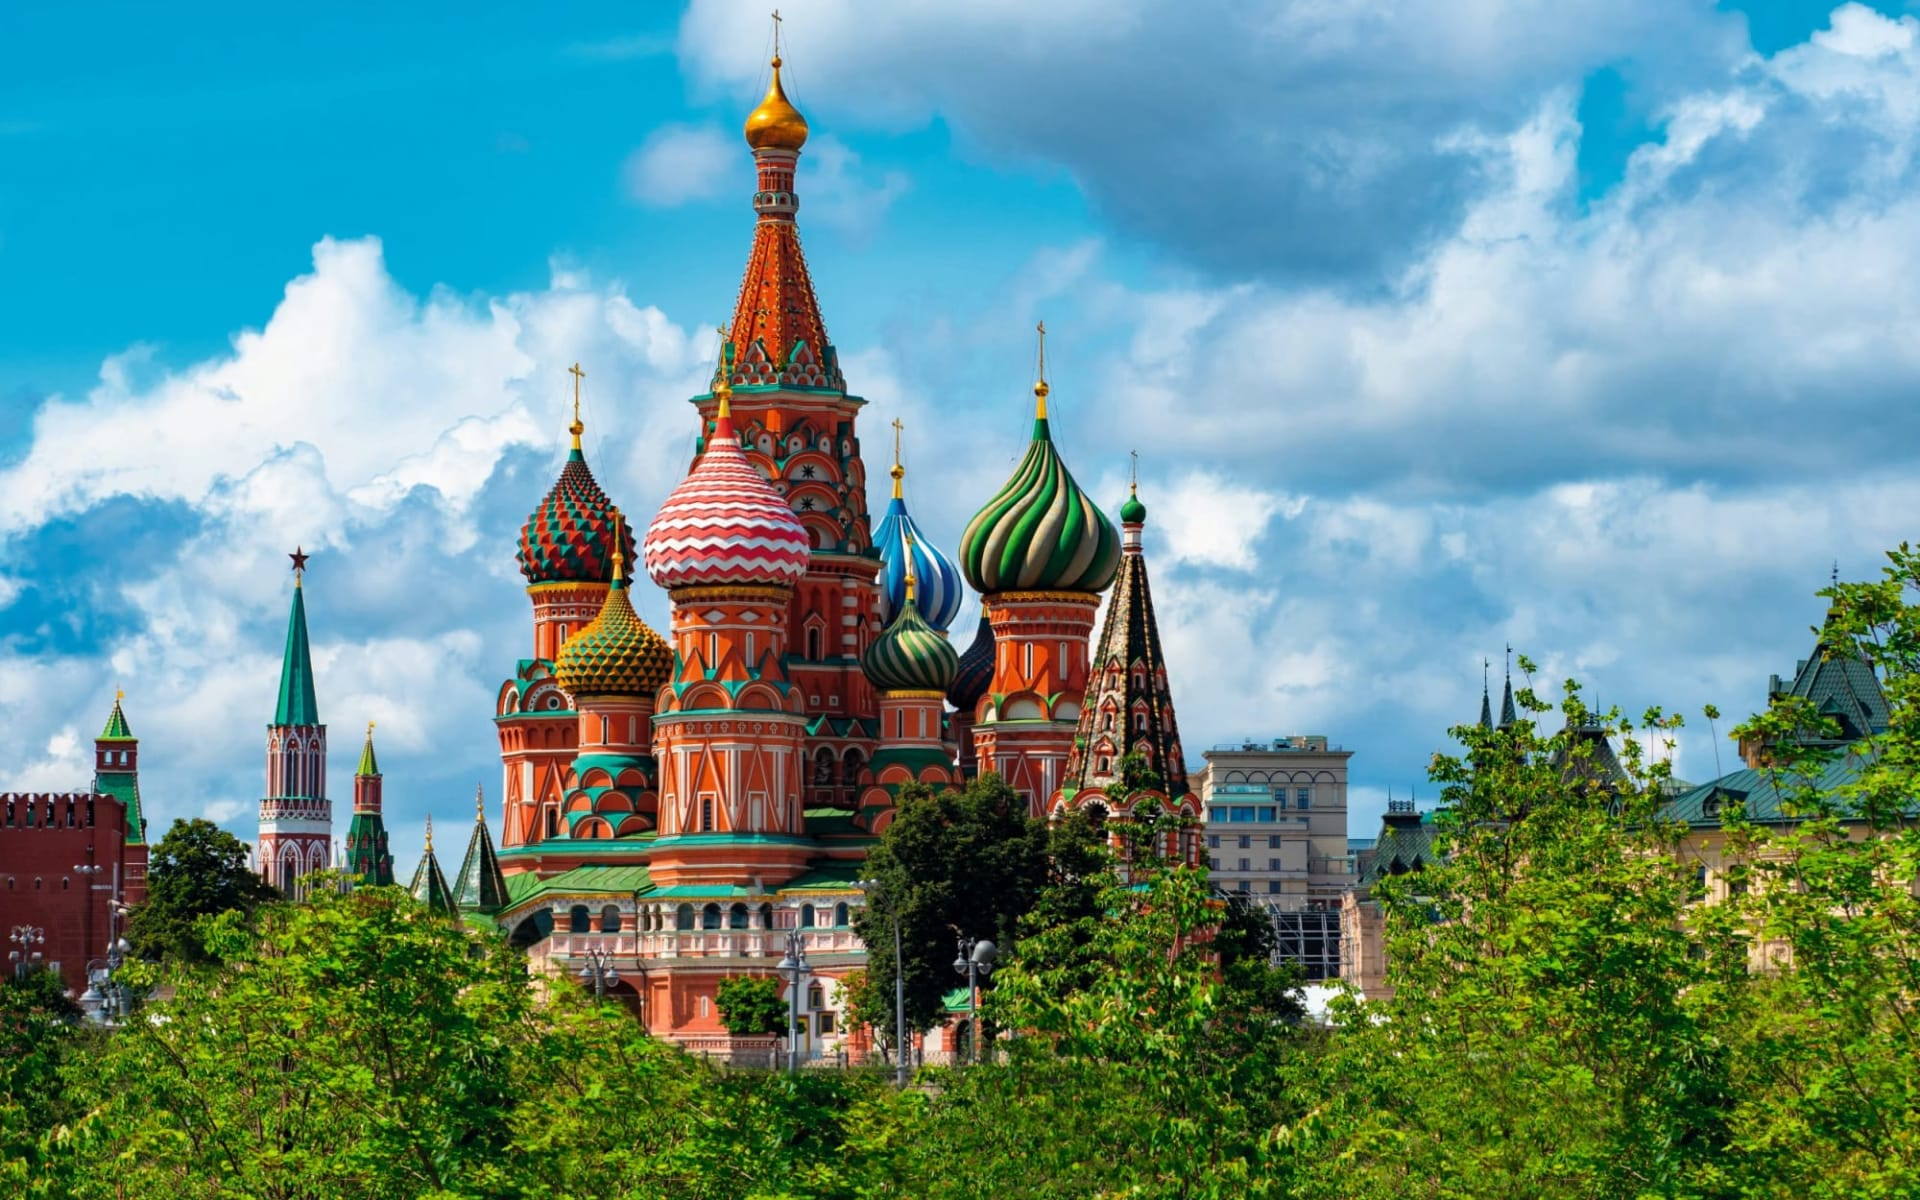 Sonderzug Zarengold Wladiwostok - Moskau: Russlan_Moskau_BasiliusKathedrale_